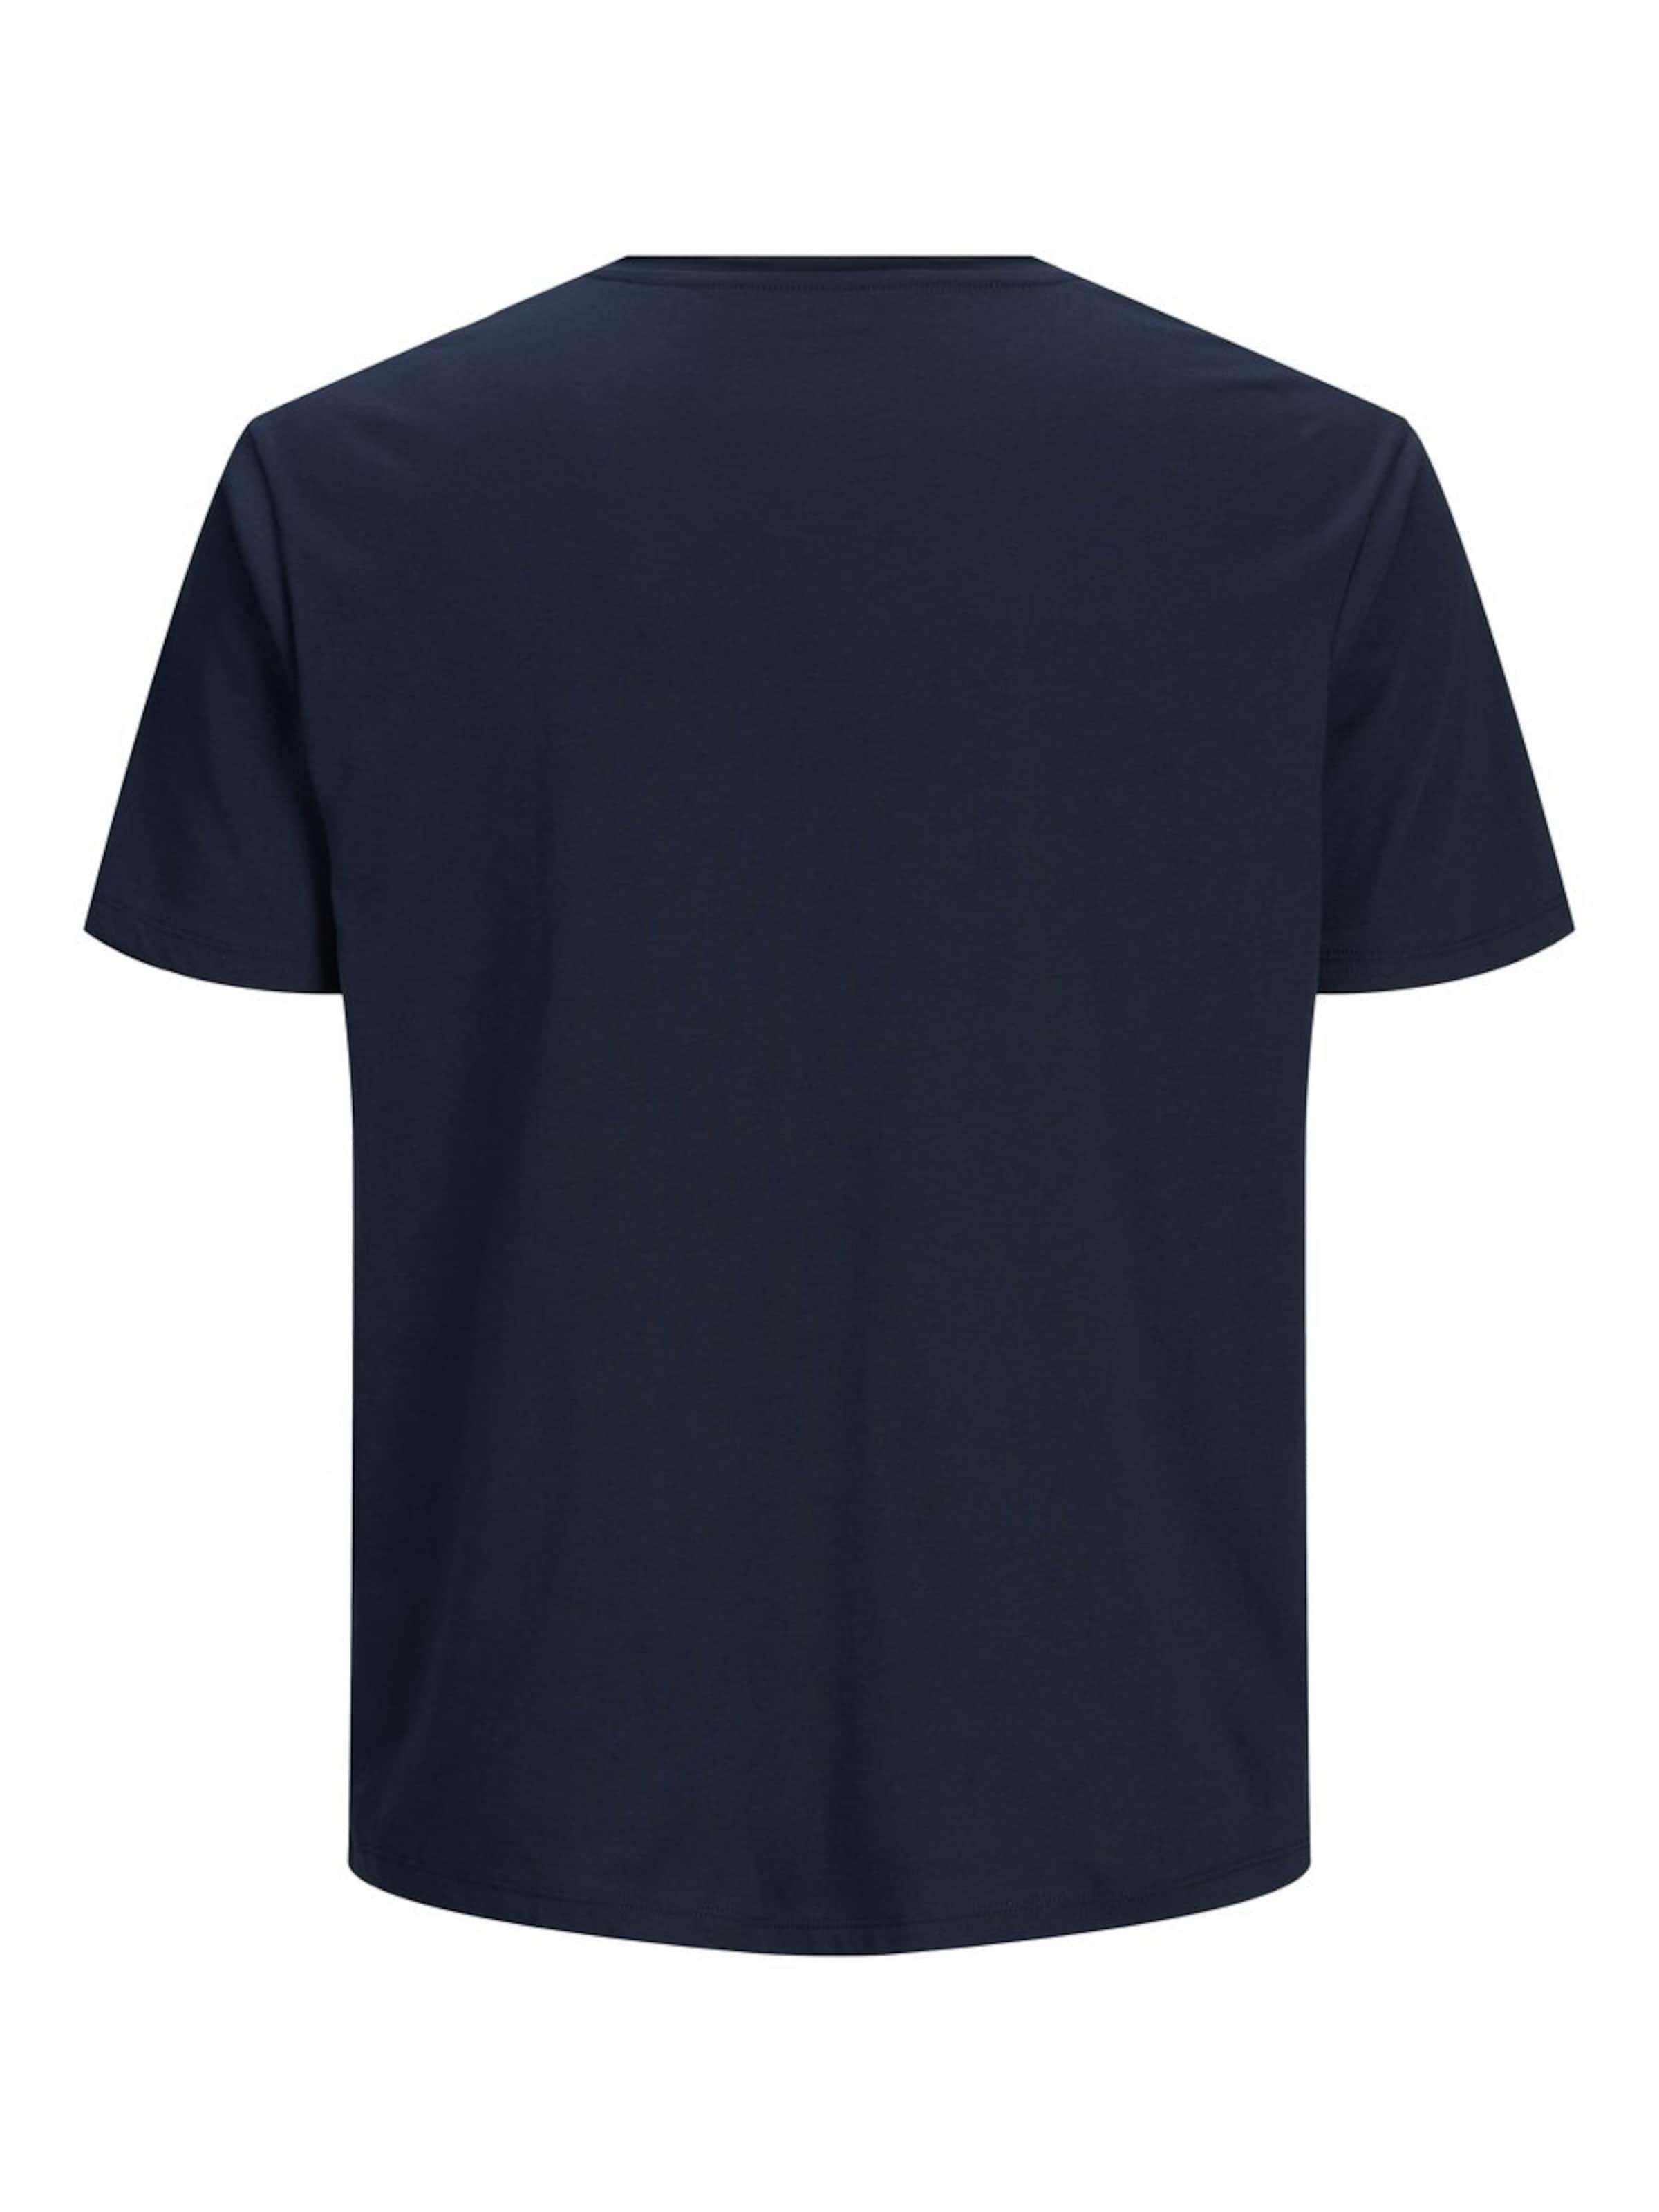 Jones En Nuit Jackamp; shirt Bleu T LAq45j3R